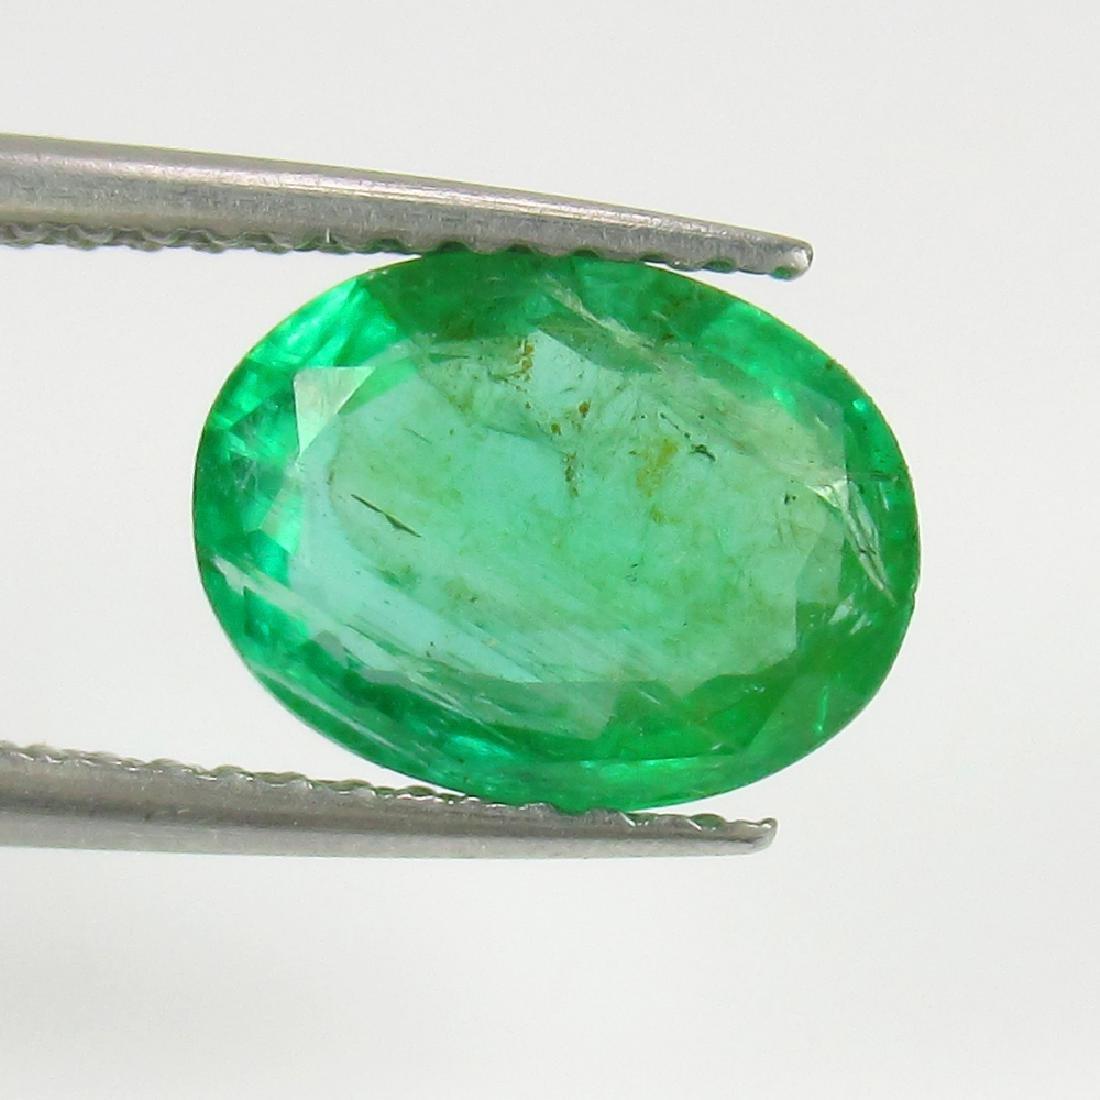 1.89 Ct IGI Certified Genuine Zambian Emerald Nice Oval - 3